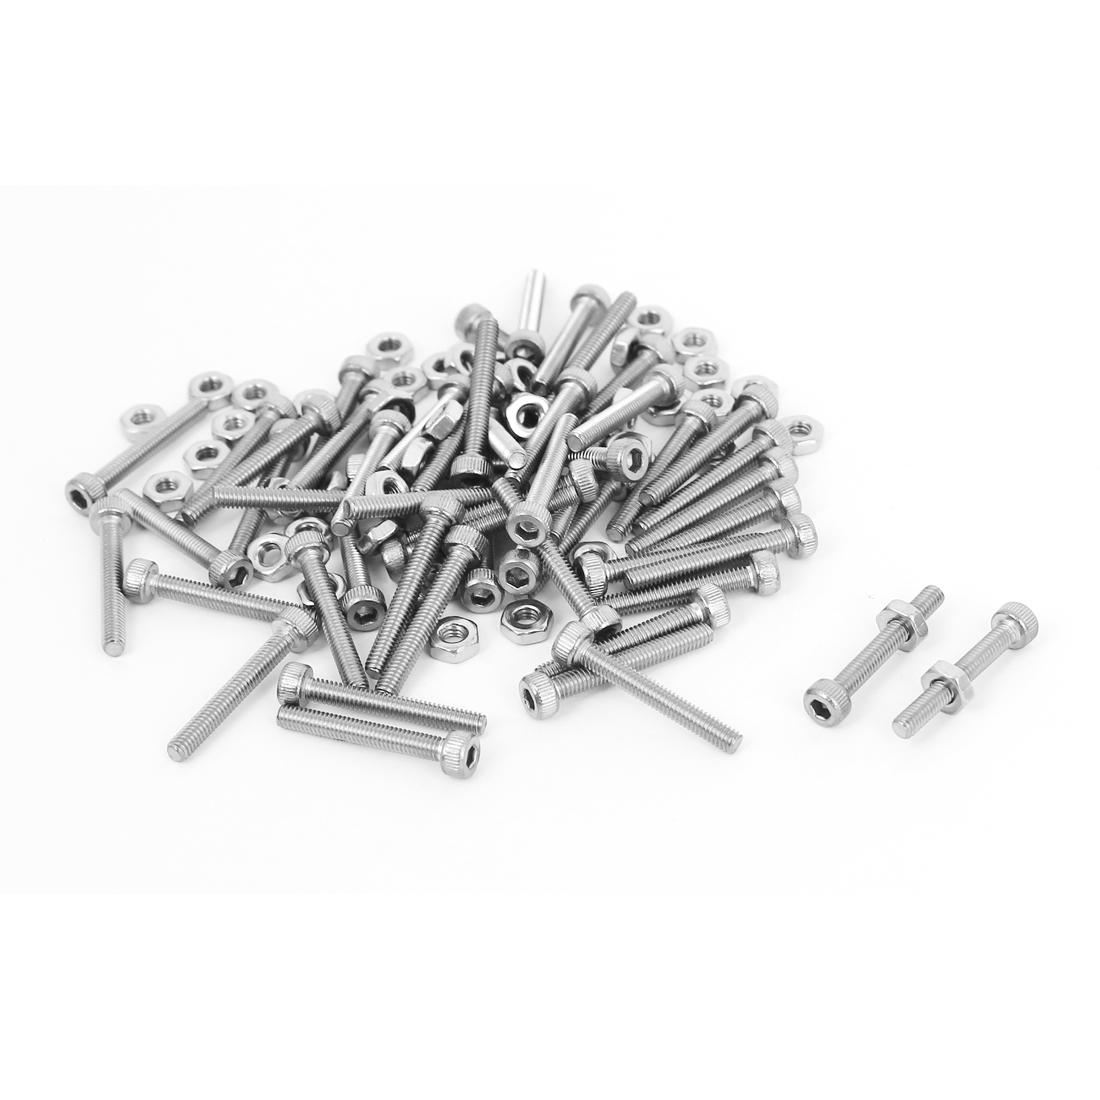 M2.5x18mm Stainless Steel Hex Socket Head Knurled Cap Screws Bolts Nut Set 50Pcs